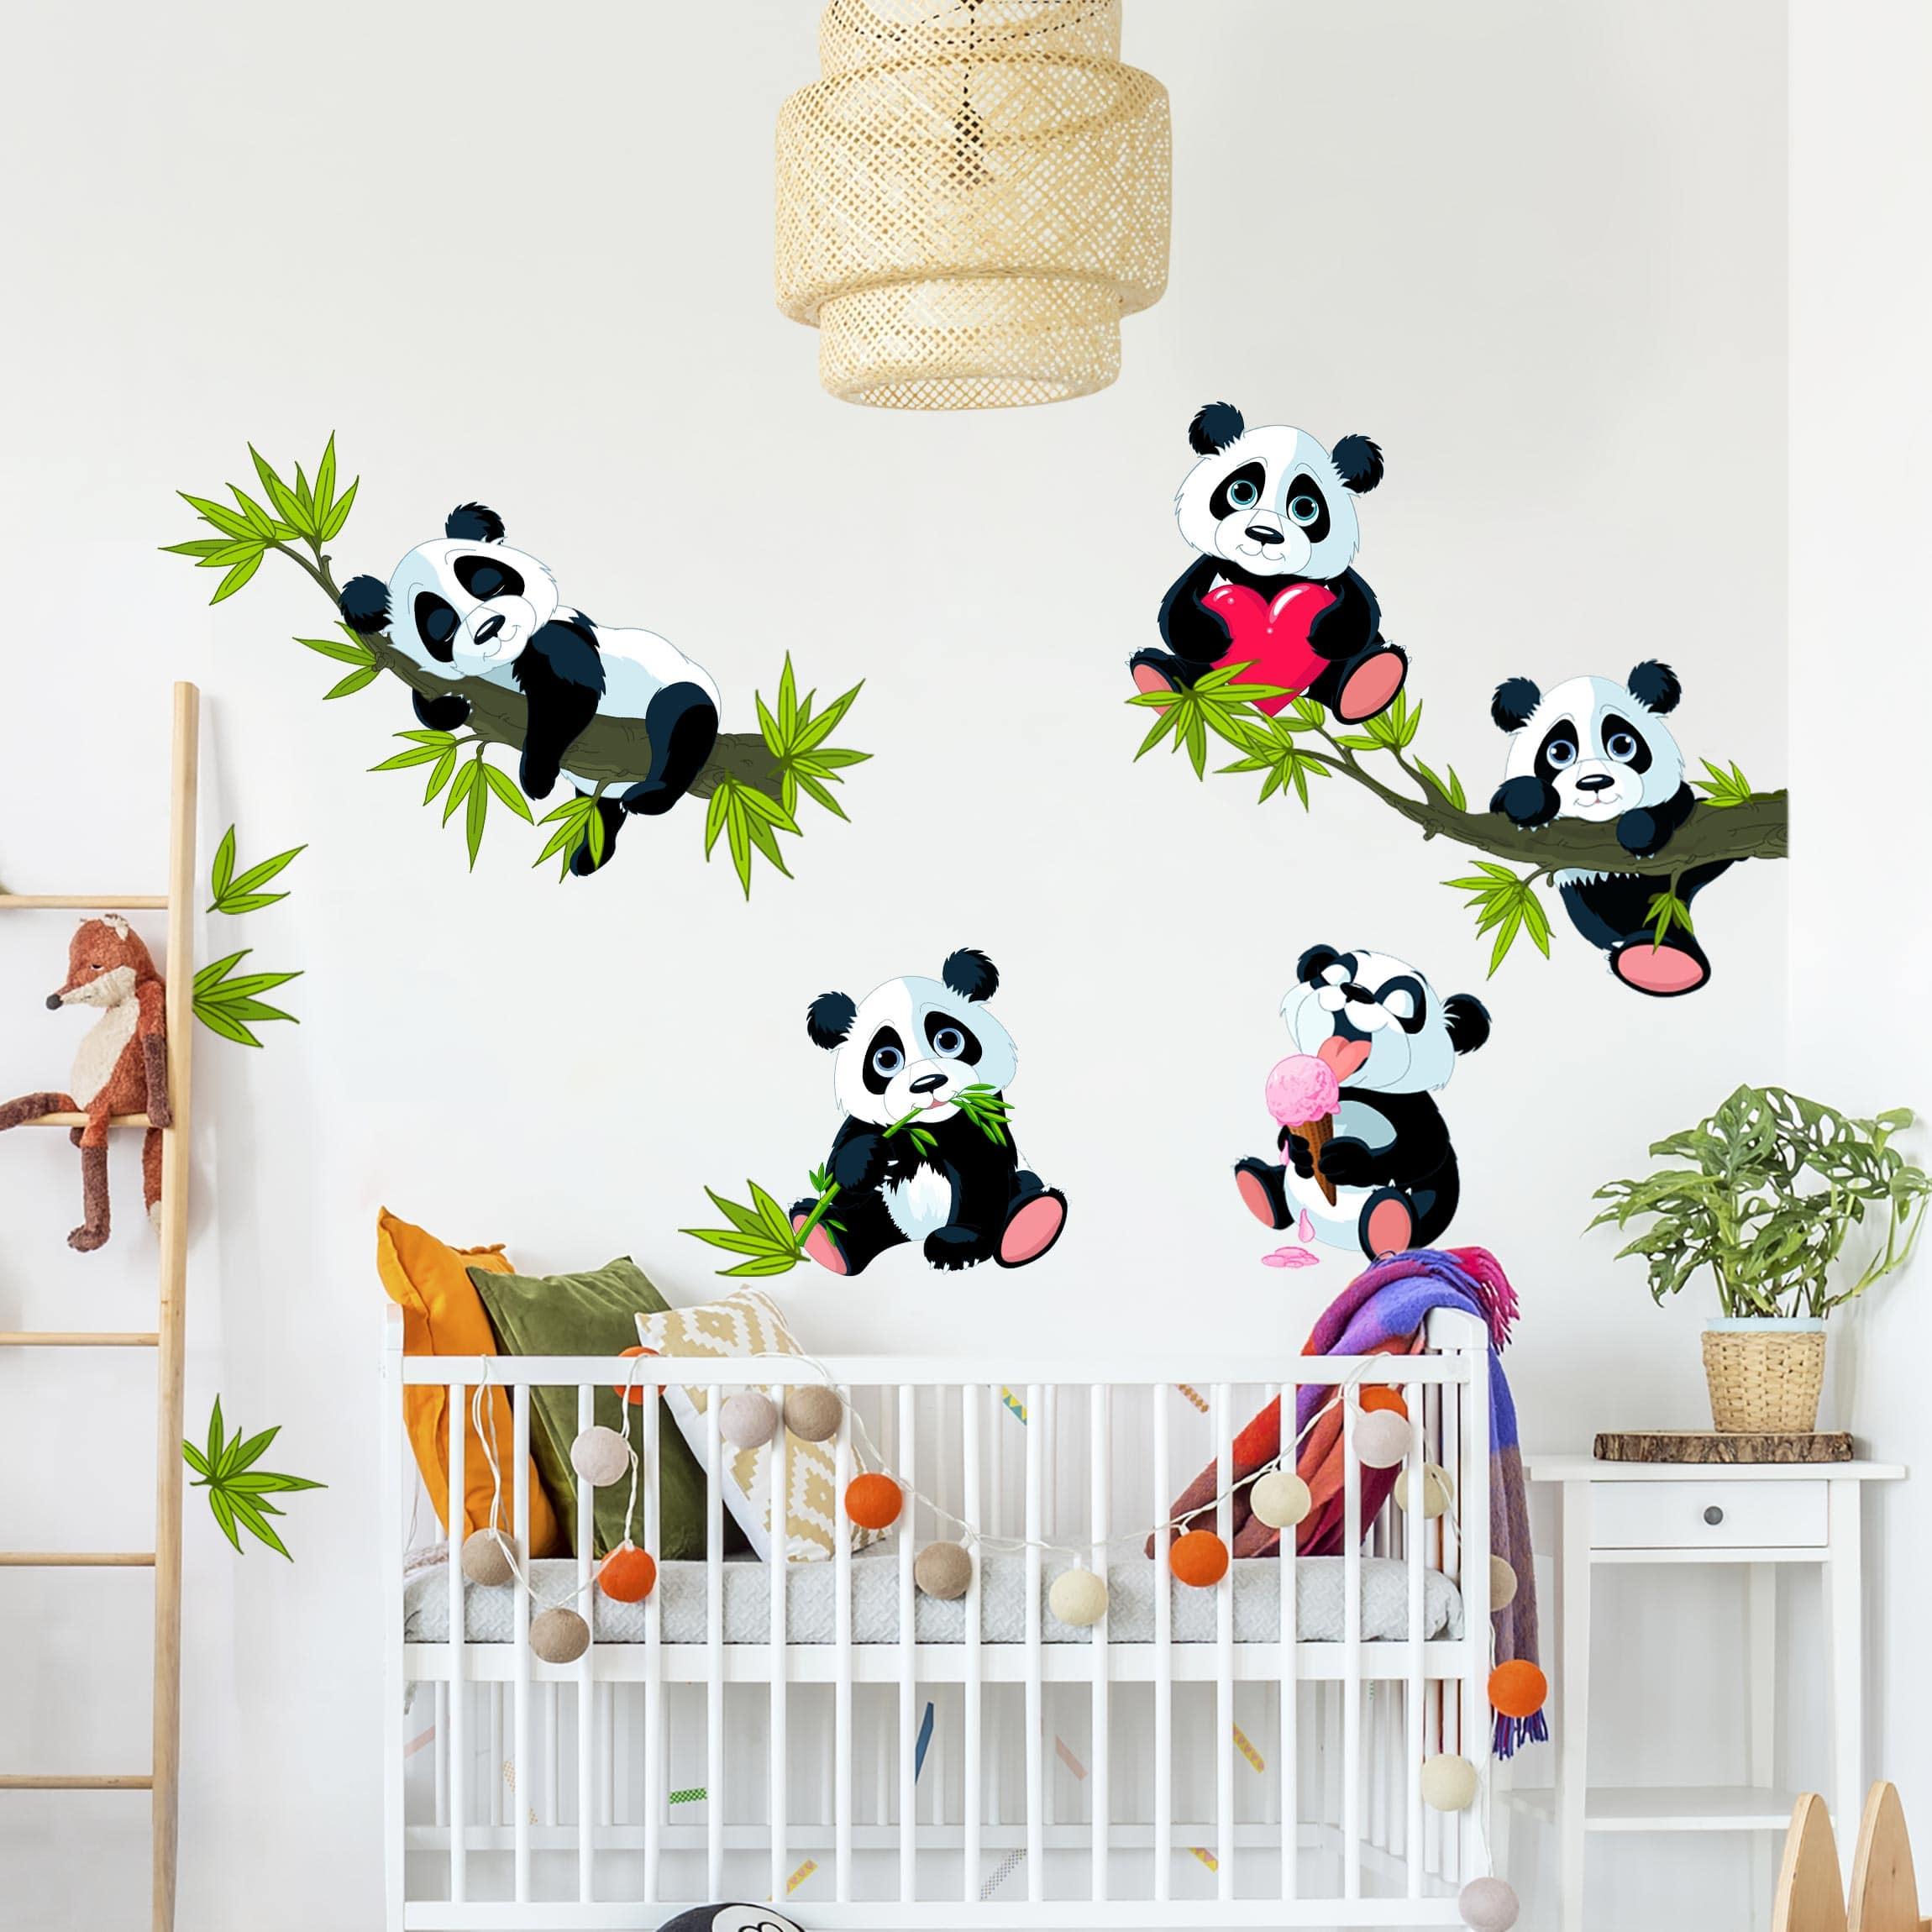 Adesivi Murali Orsetti.Adesivi Murali Bambini Set Di Dolci Orsetti Panda Stickers Cameretta